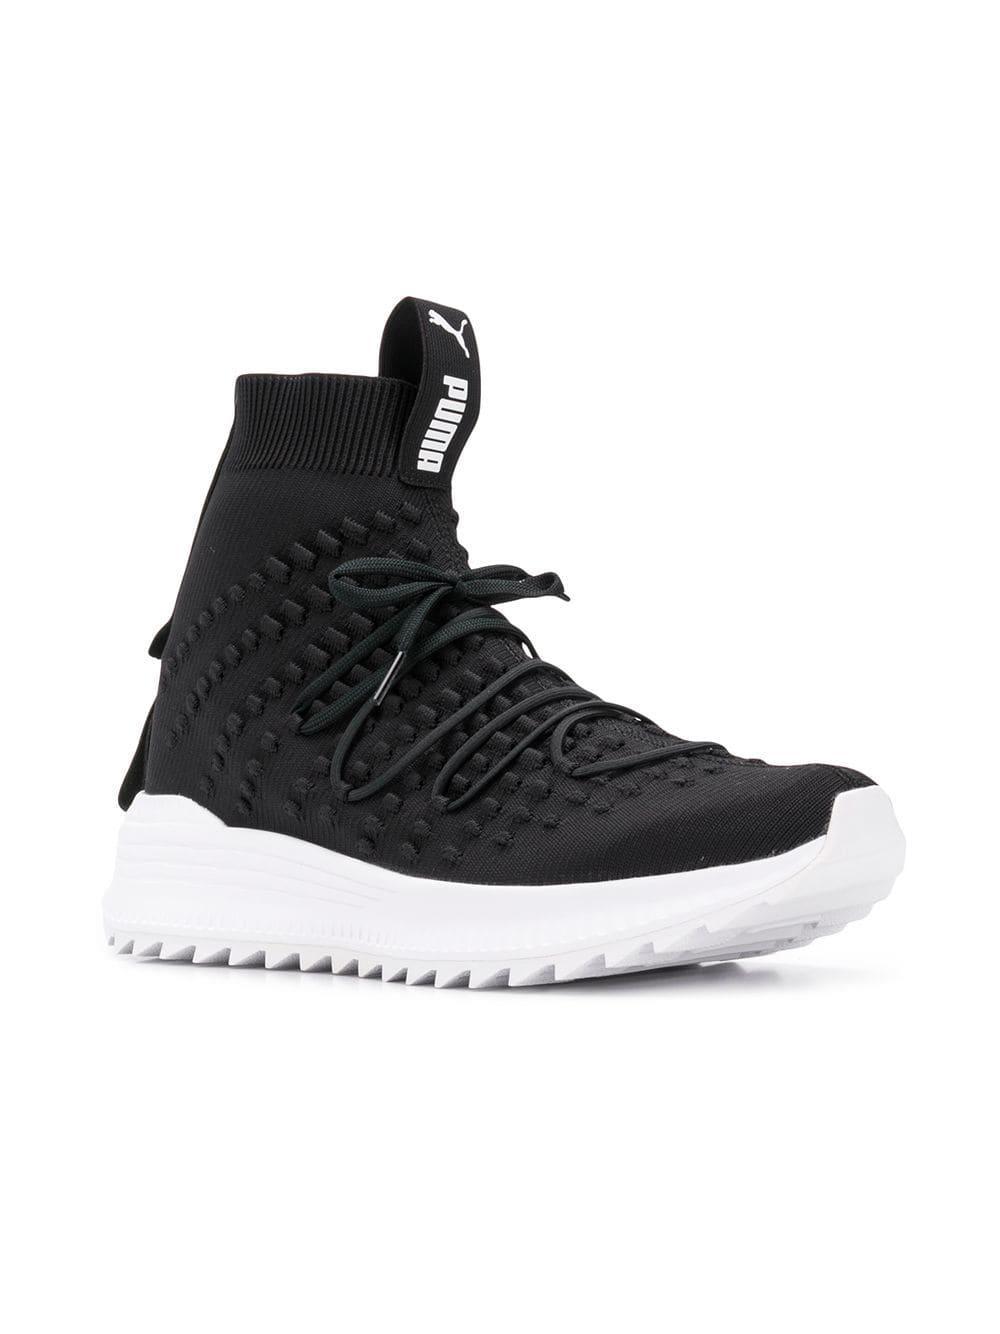 db437d4cdd085d Lyst - PUMA Avid Fusefit Mid Sneakers in Black for Men